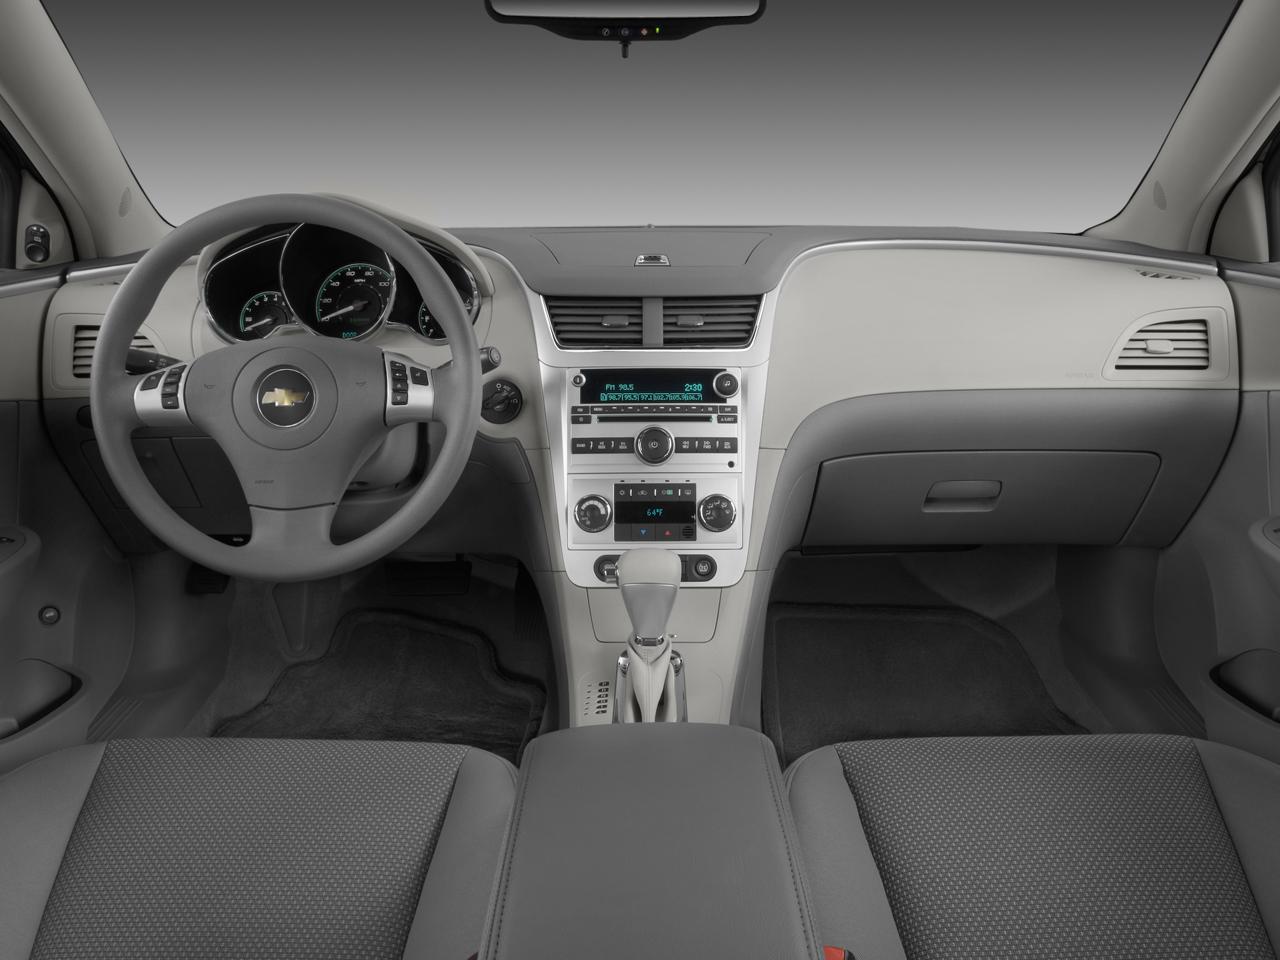 2009 Chevy Malibu LTZ - Fuel Efficient News, Car Features ...